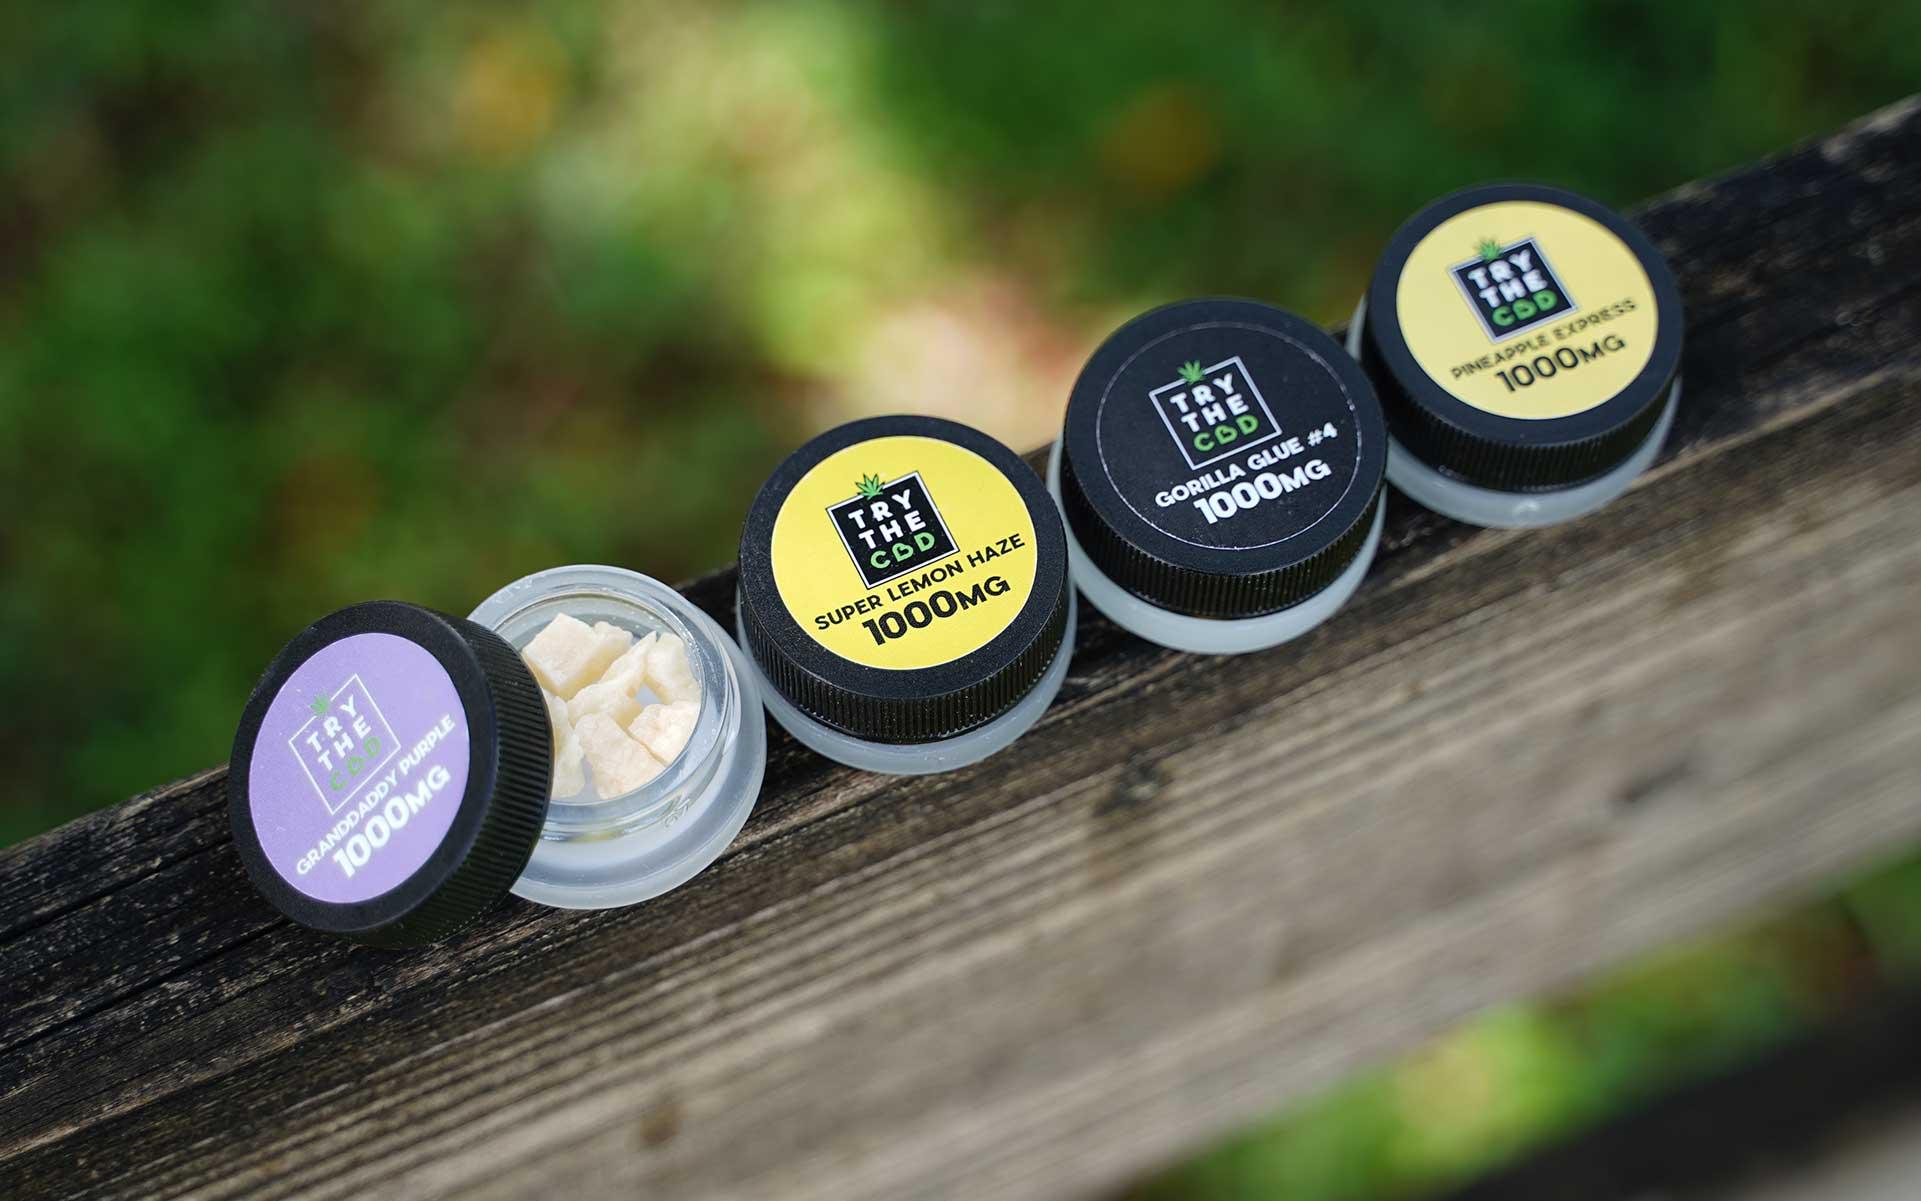 Try The CBD isolate jars in Super Lemon Haze, Grandaddy Purple, Gorilla Glue and Pineapple Express